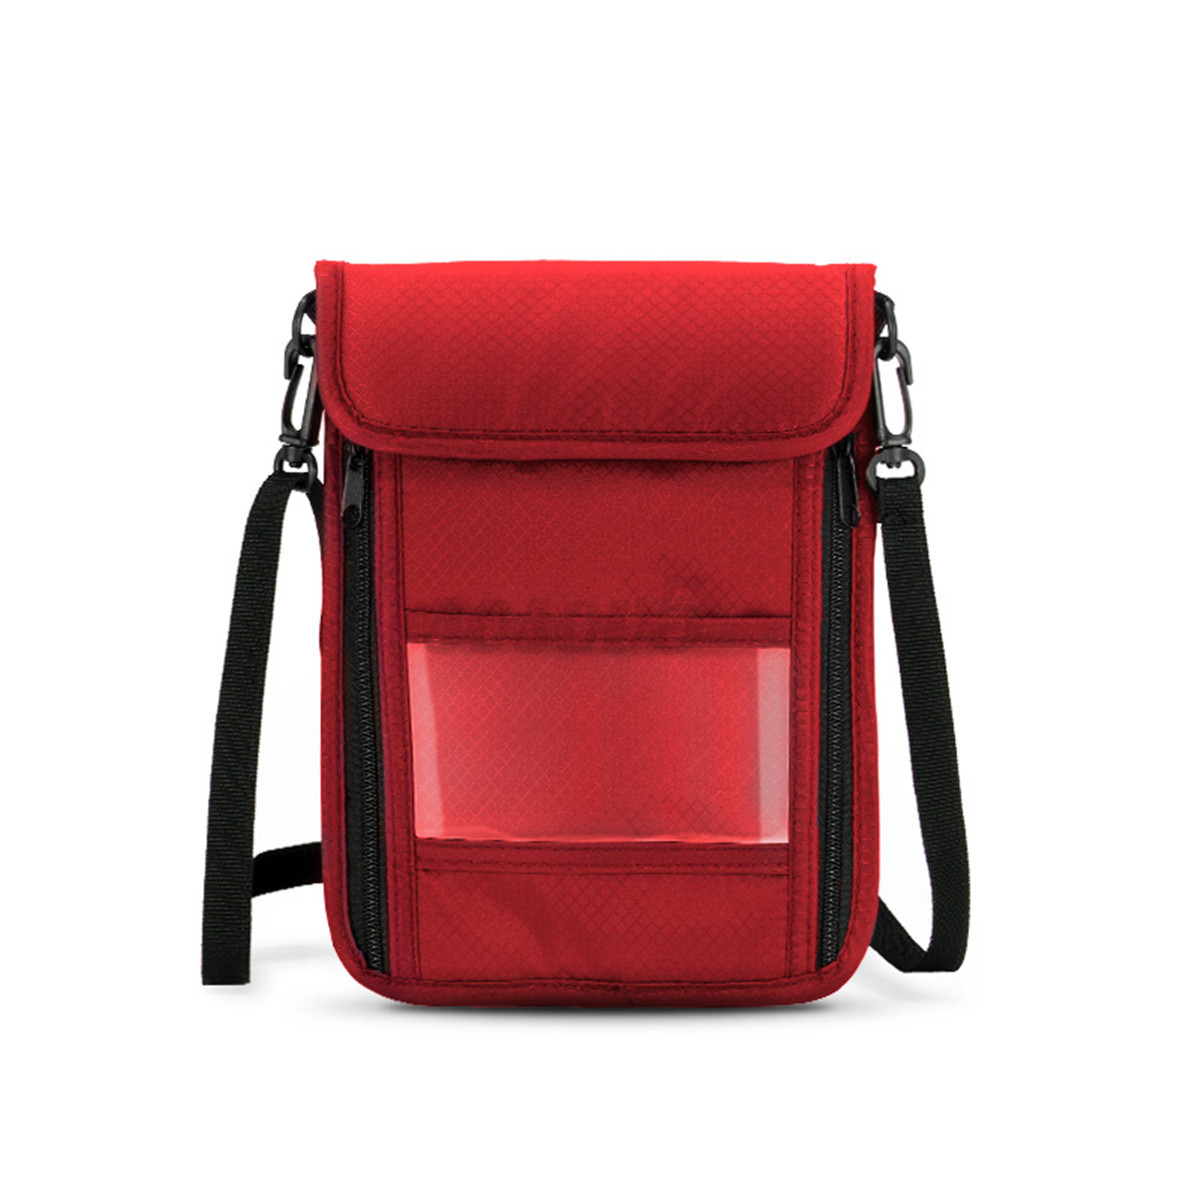 canvas travel passport document organizer credit card wallet holder pouch bag ebay. Black Bedroom Furniture Sets. Home Design Ideas